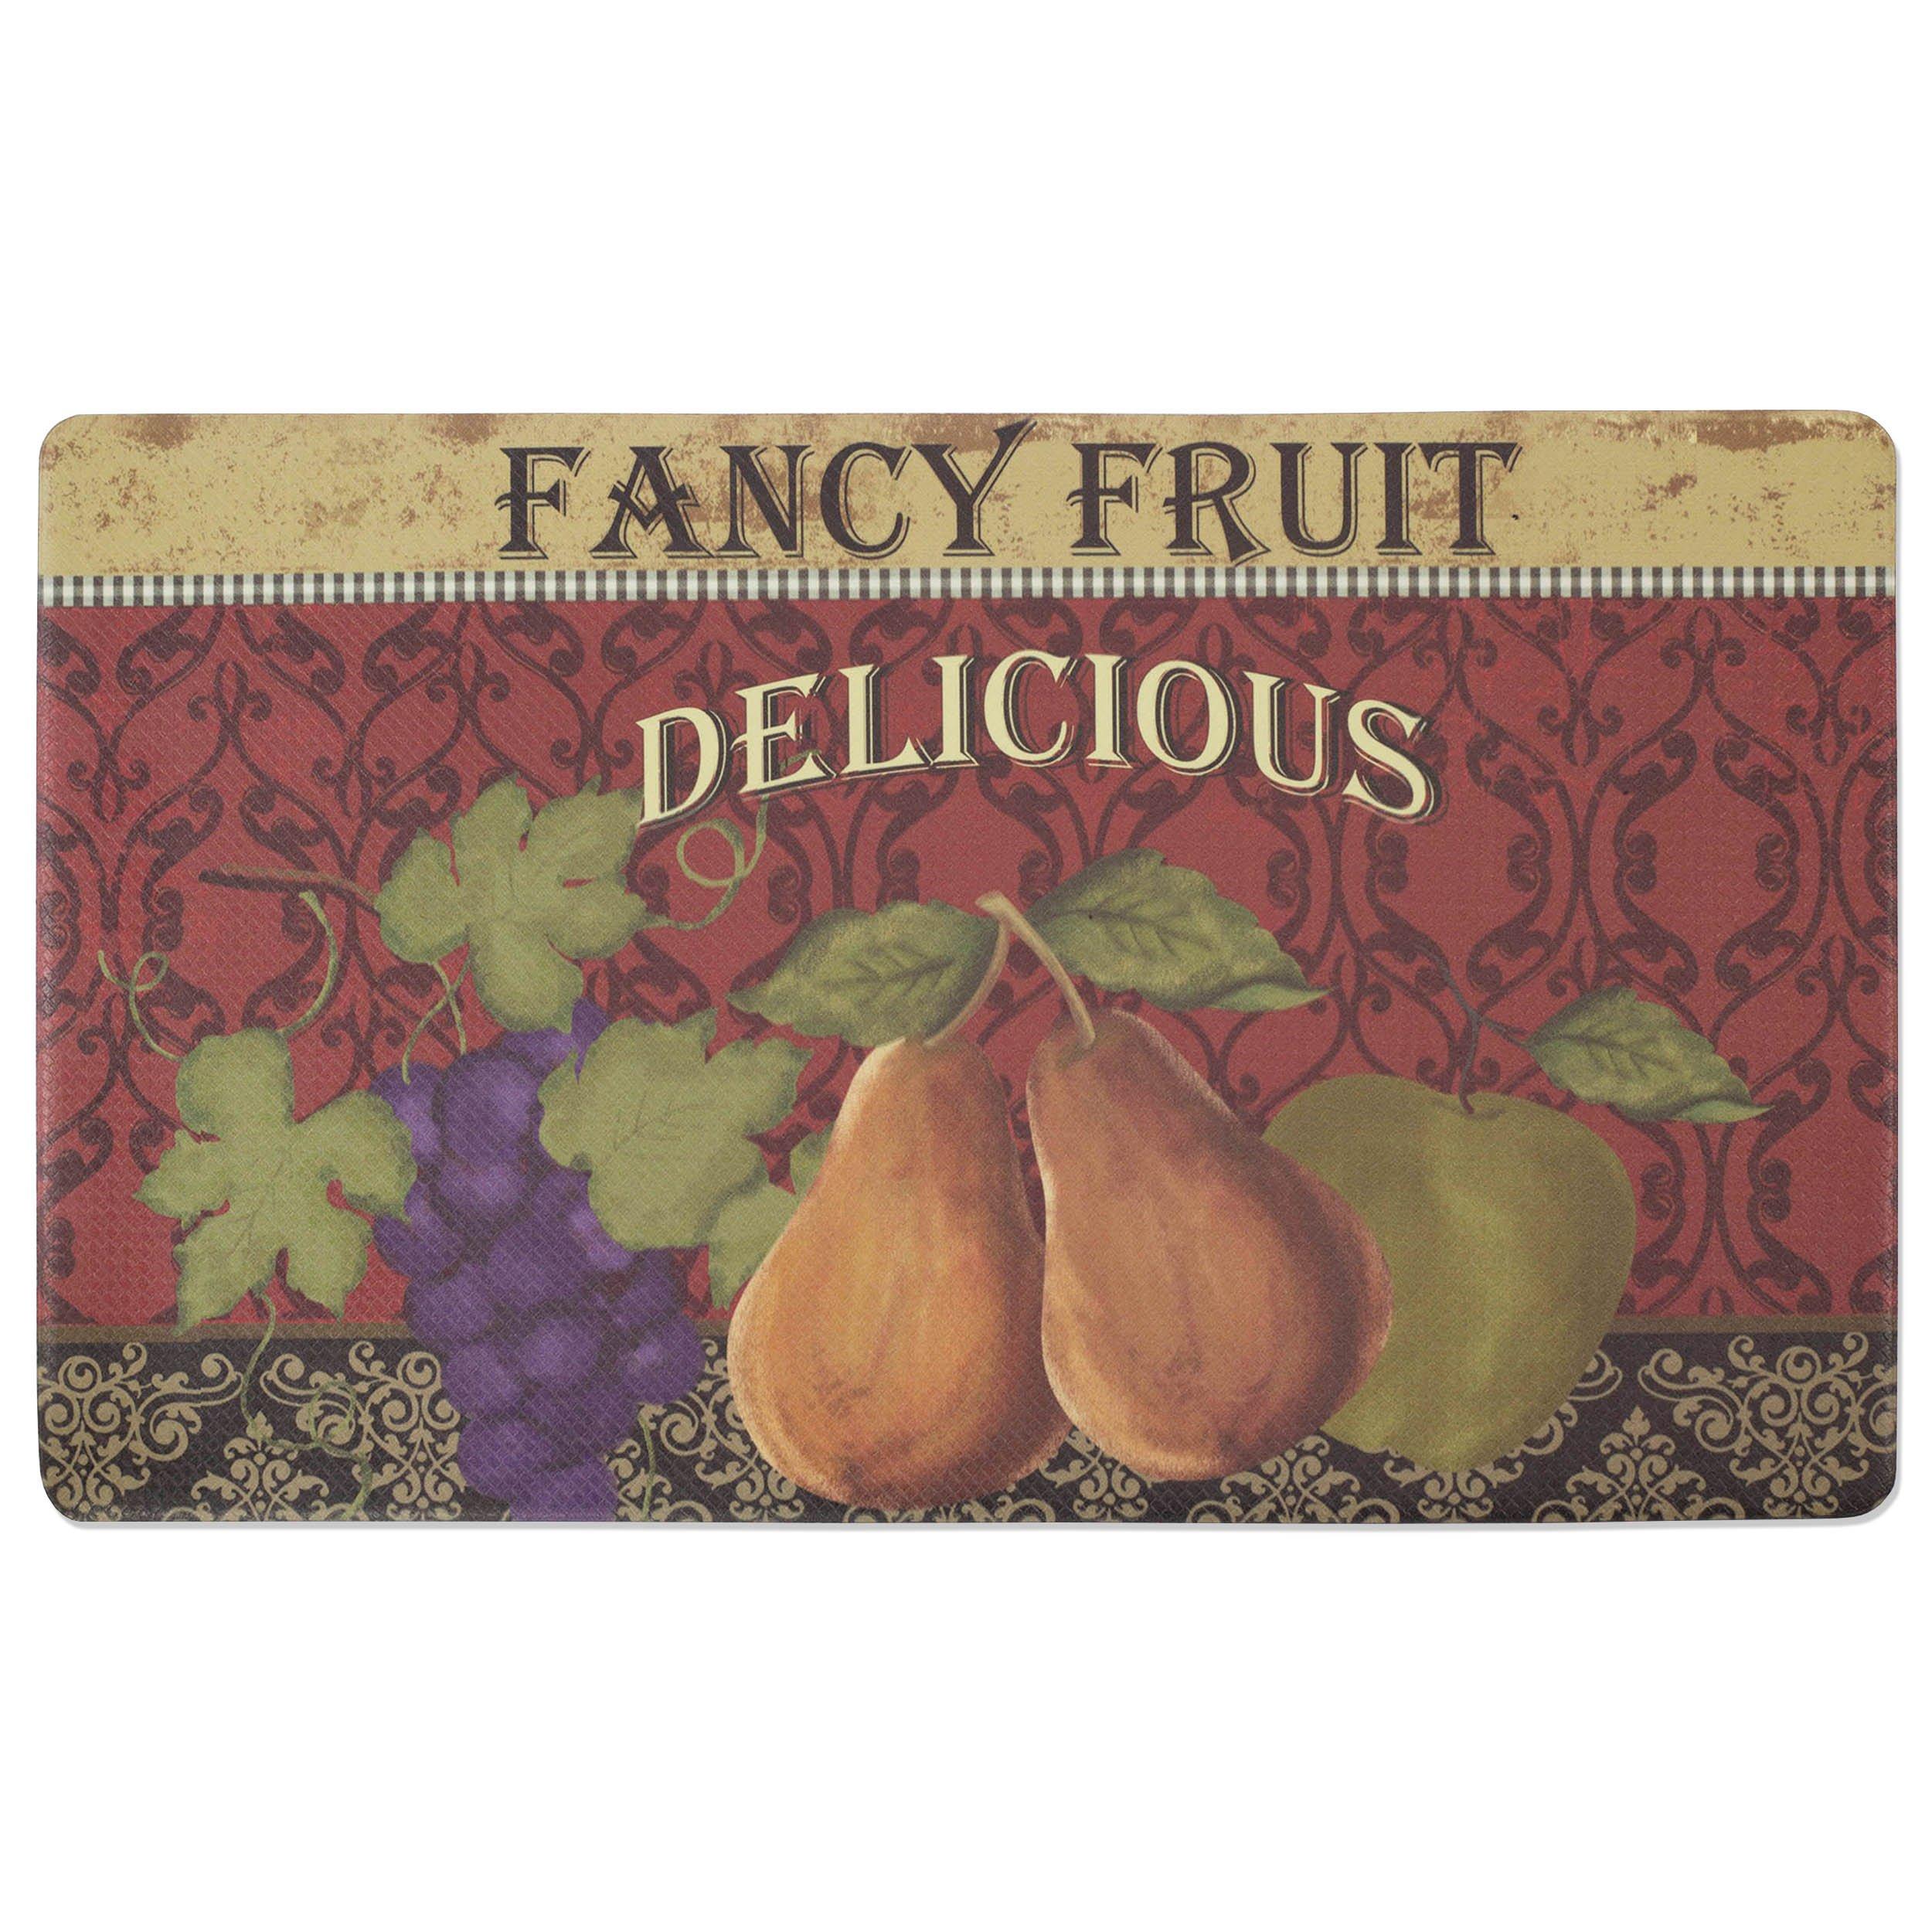 Chef Gear Fancy Fruit Anti-Fatique Comfort Memory Foam Chef Mat, 18 by 30-Inch